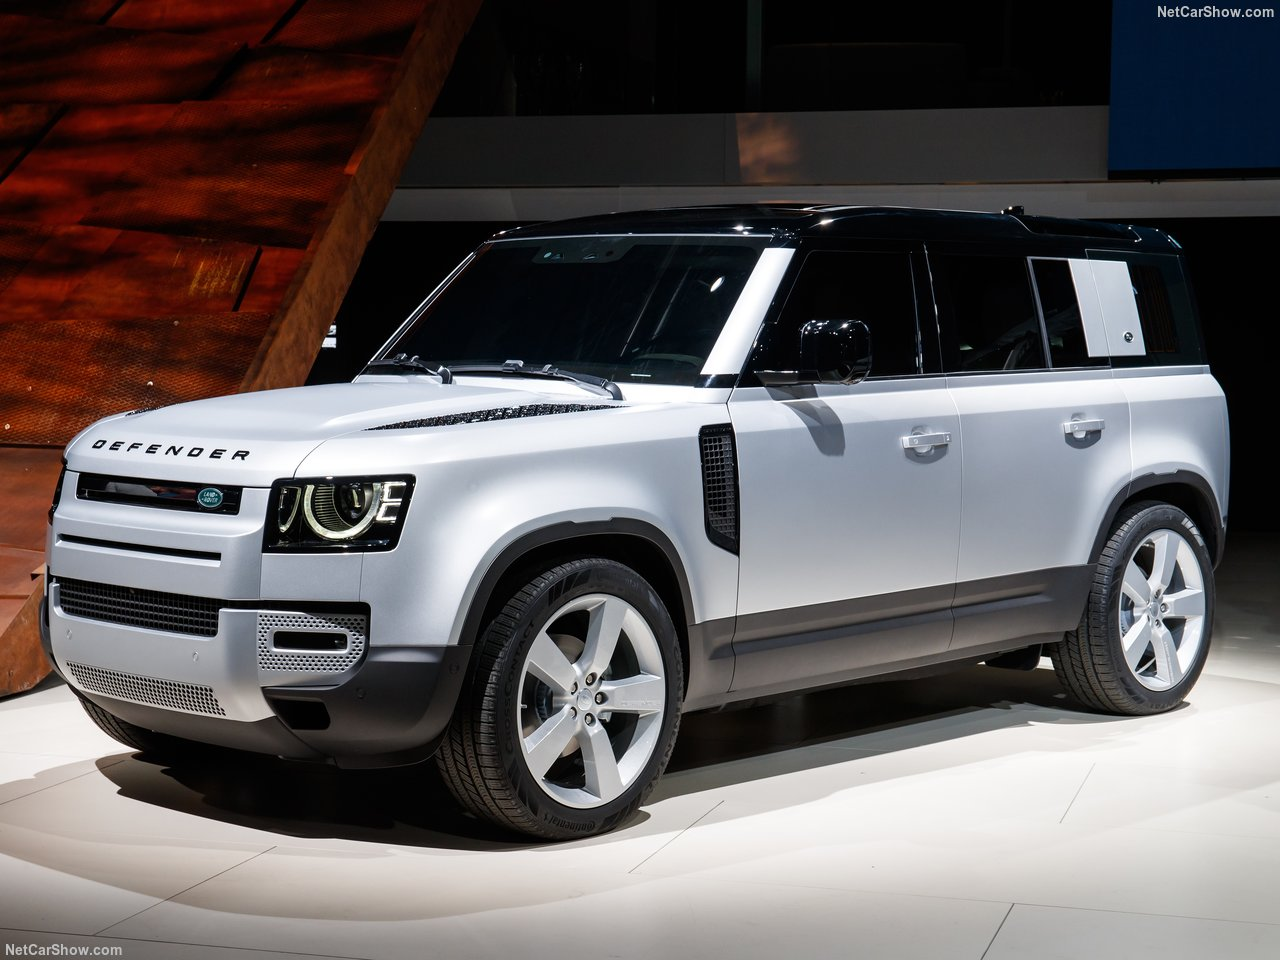 Land_Rover-Defender_110-2020-1280-69_20191120194649b0a.jpg